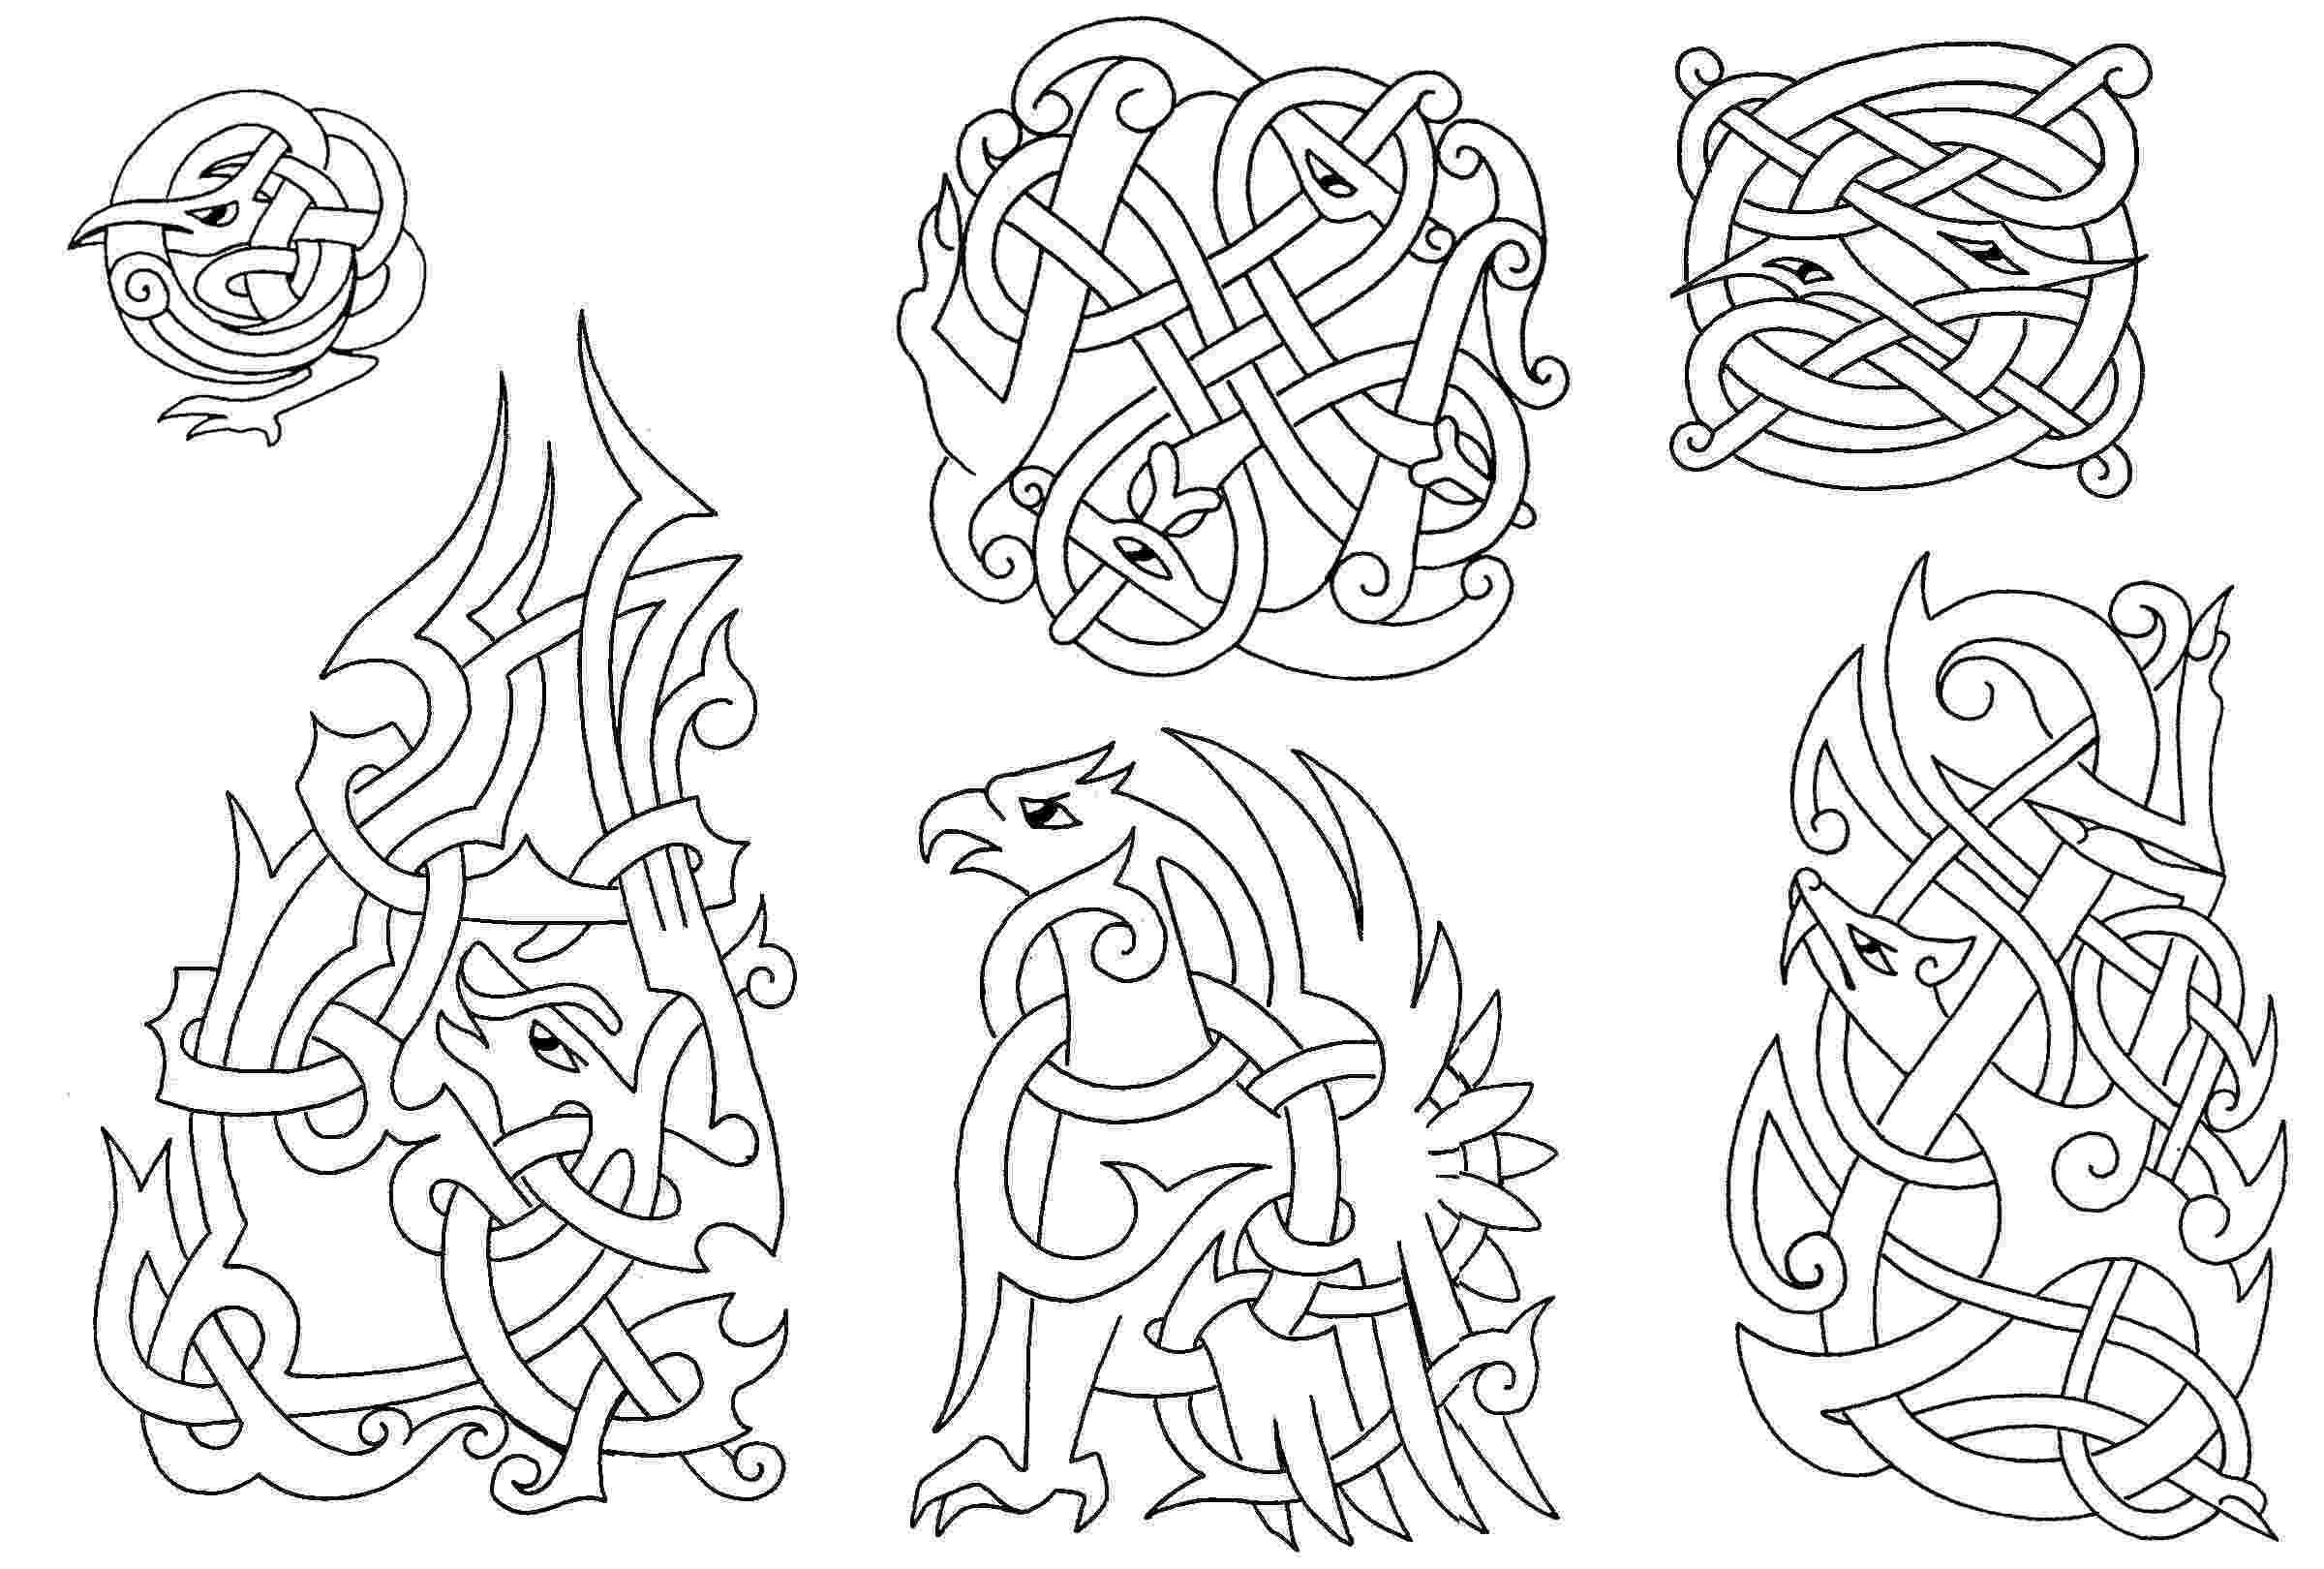 celtic art celtic knot meanings design ideas and inspiration art celtic